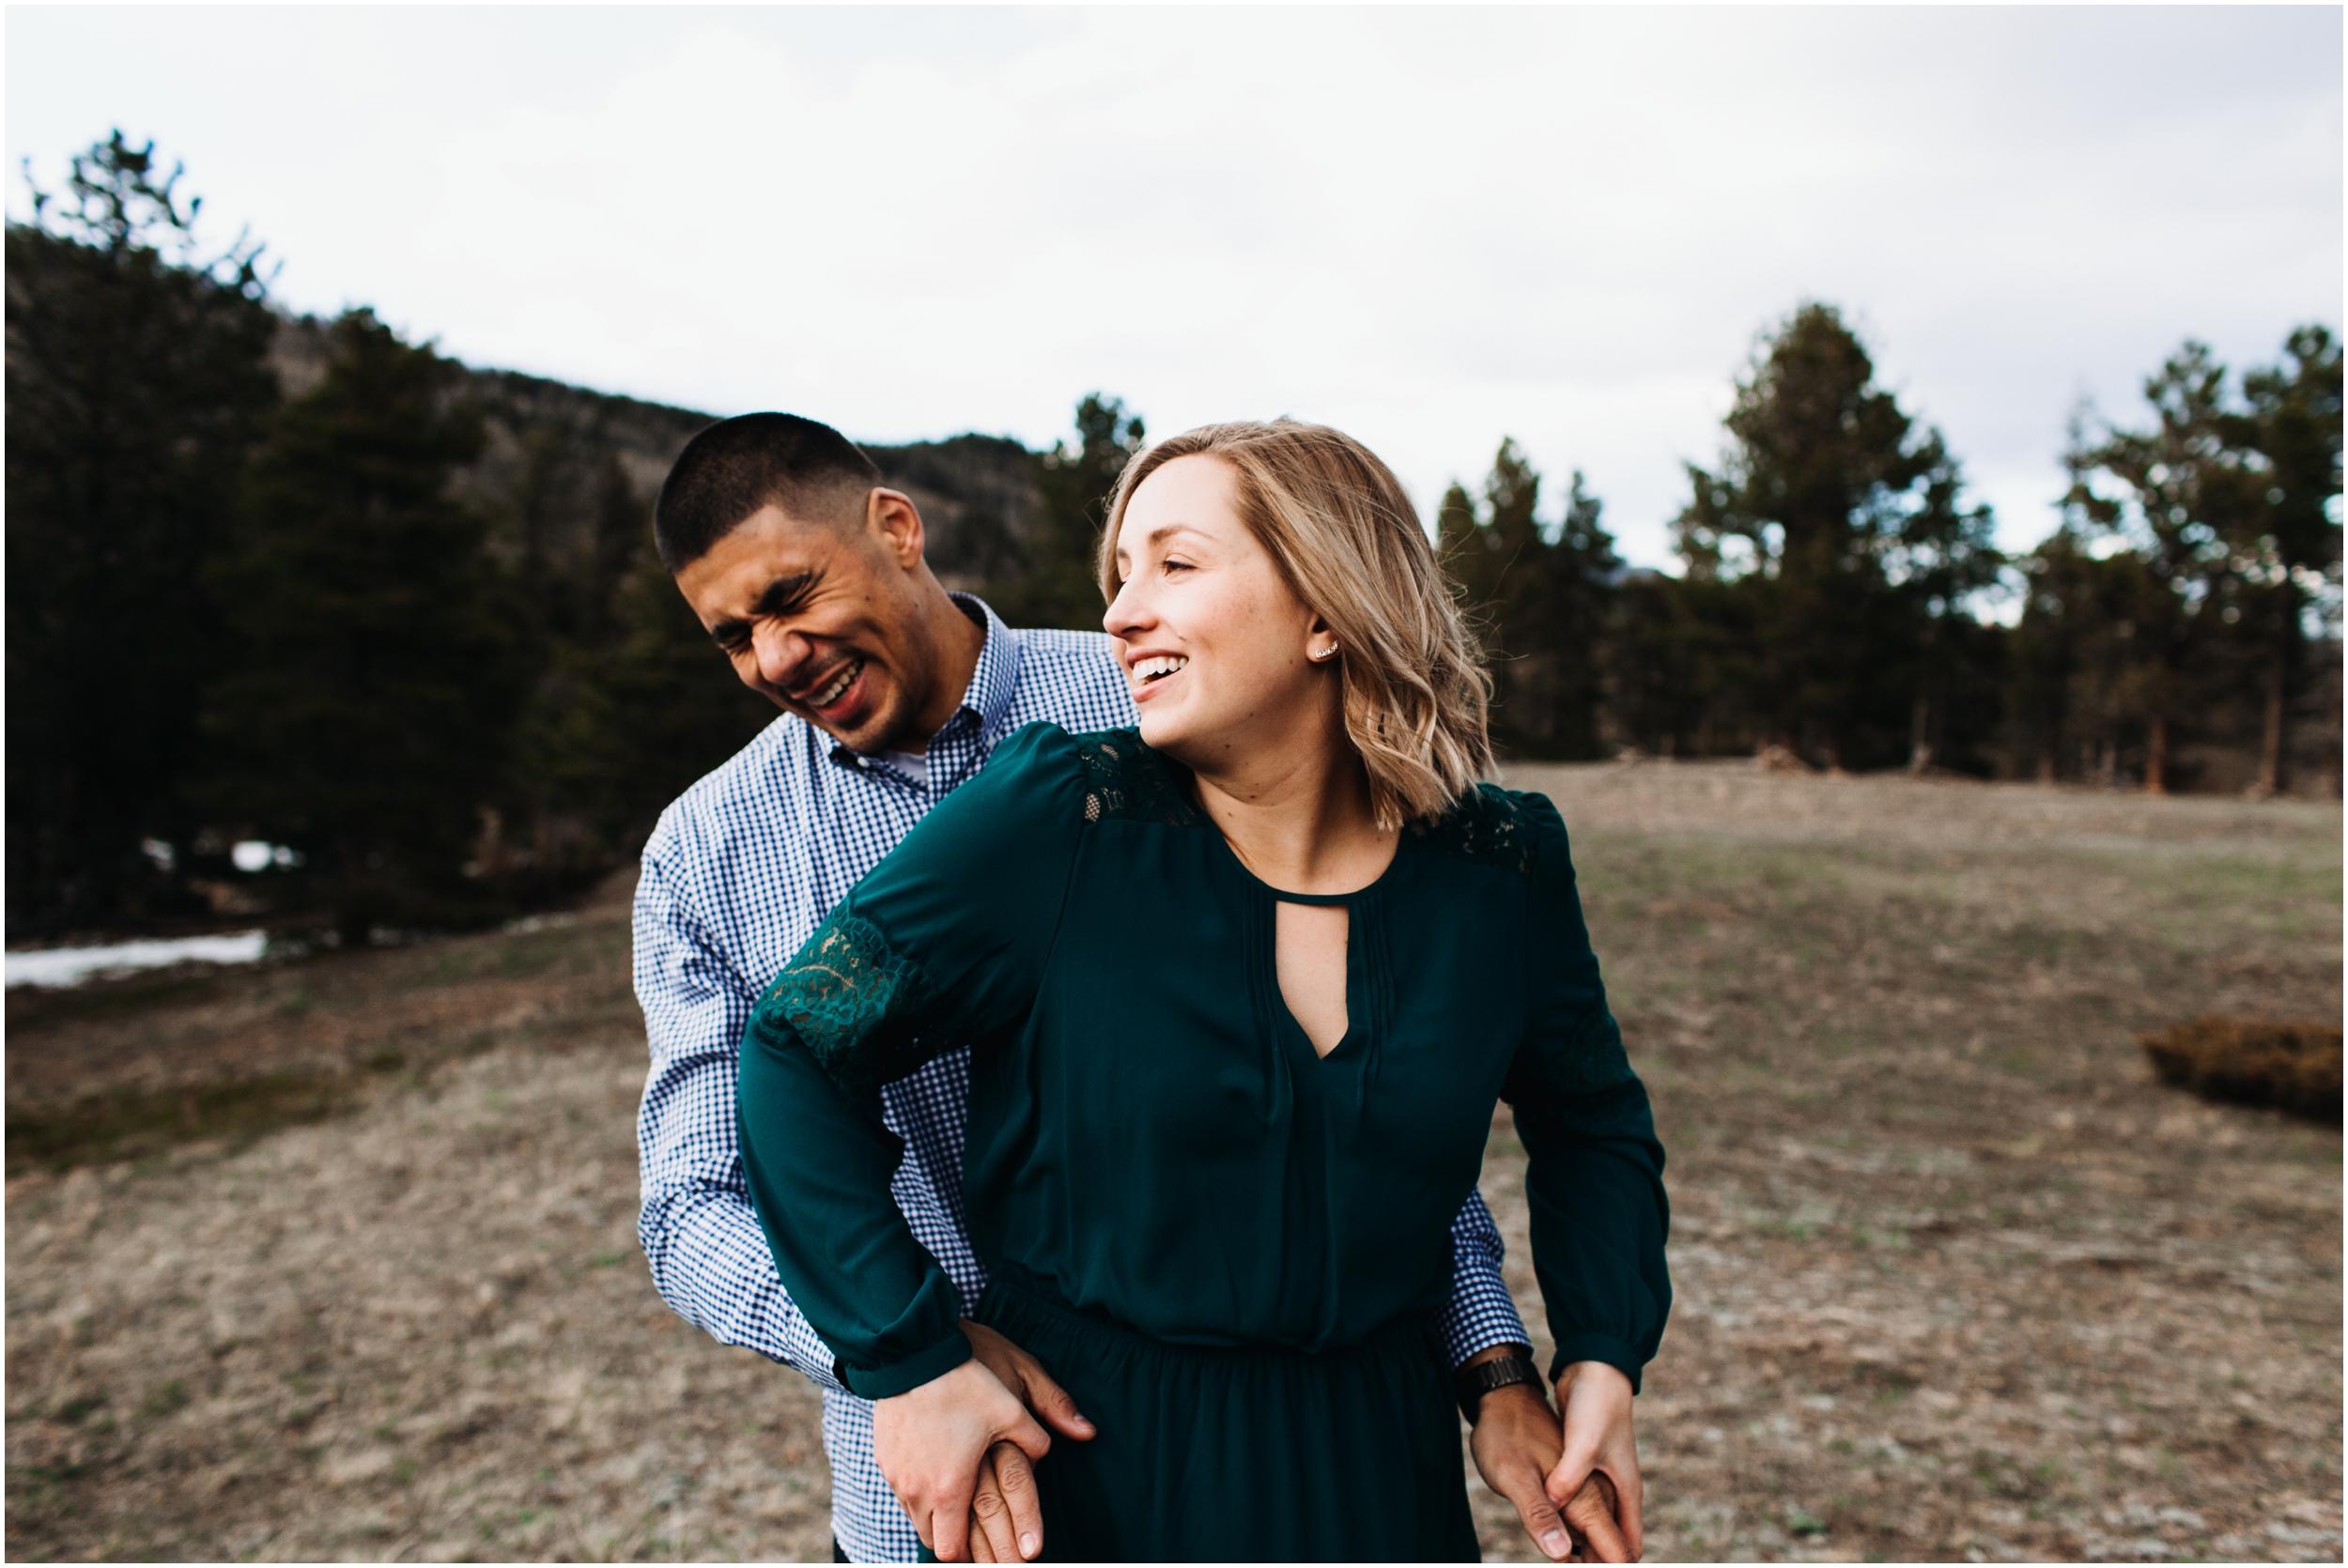 rocky-mountain-national-park-elopement-sprague-lake-colorado-adventure-wedding-photographer_taylor-powers_138.jpg